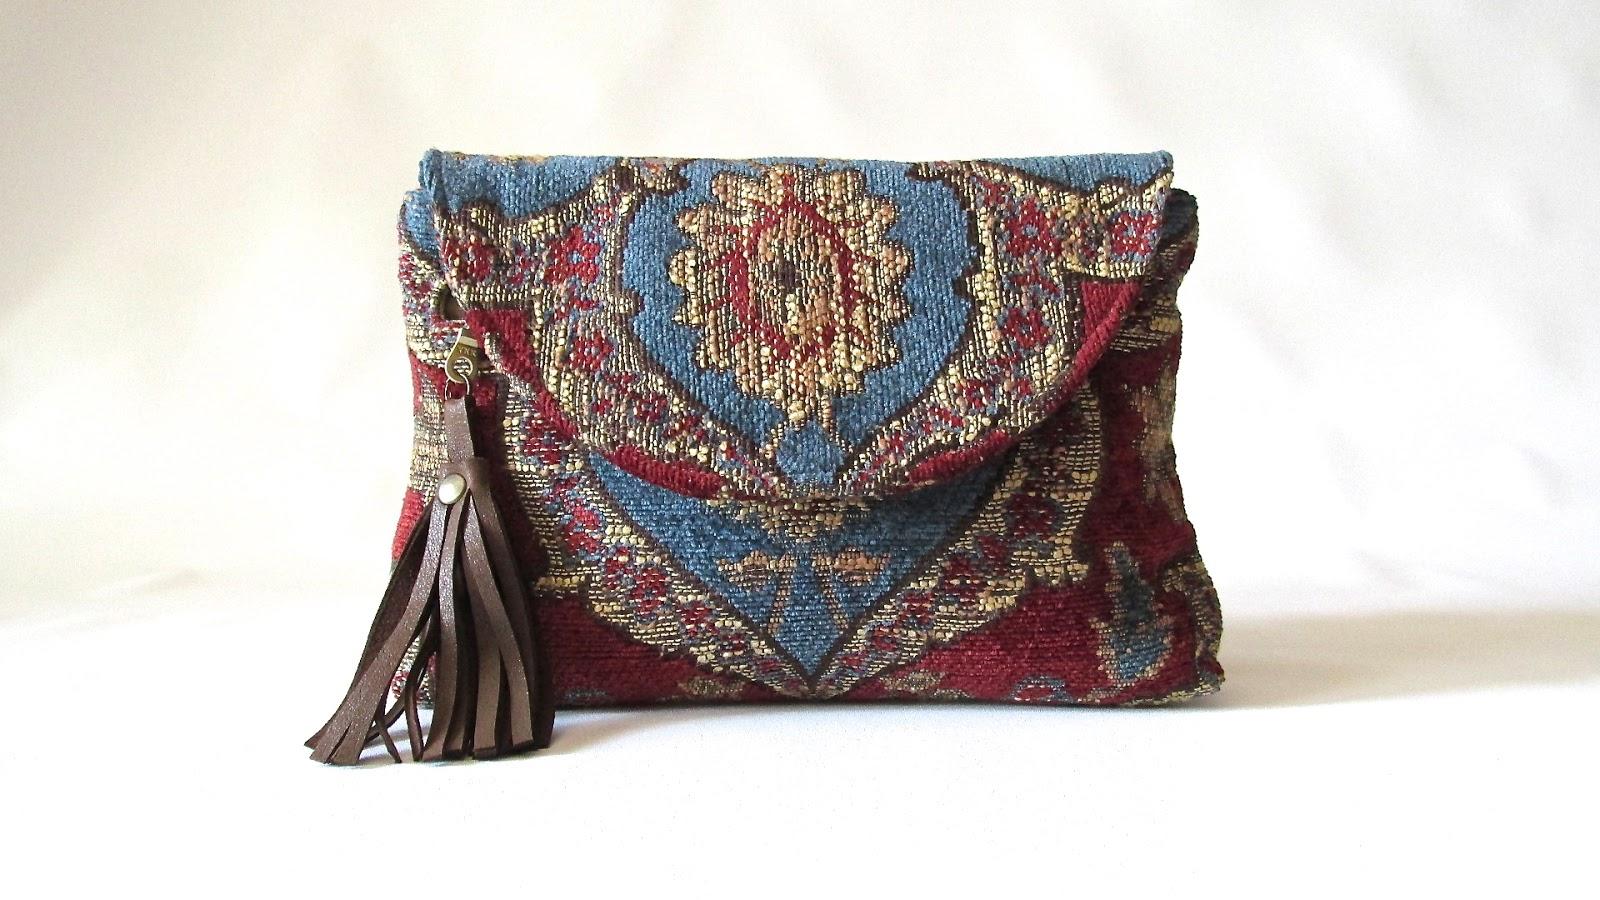 Laboratory Of Fashion Boho Tapestry Bag Clutch Purse